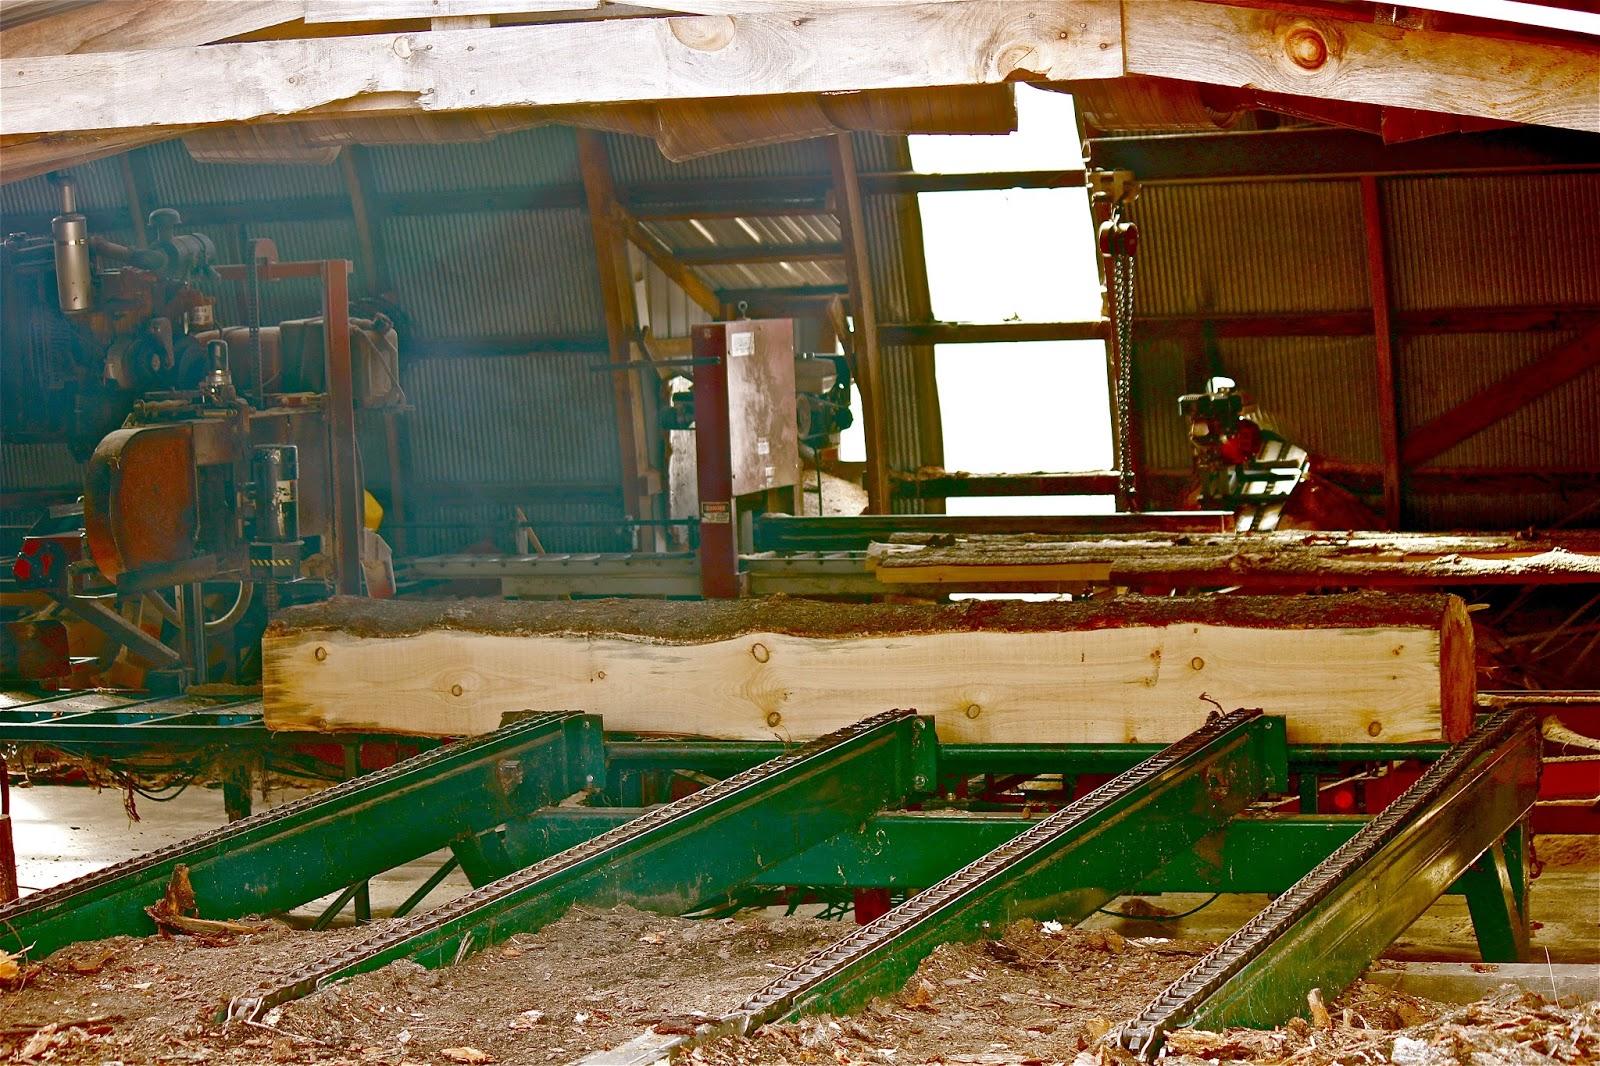 The Cabin Countess : An Amish Sawmill